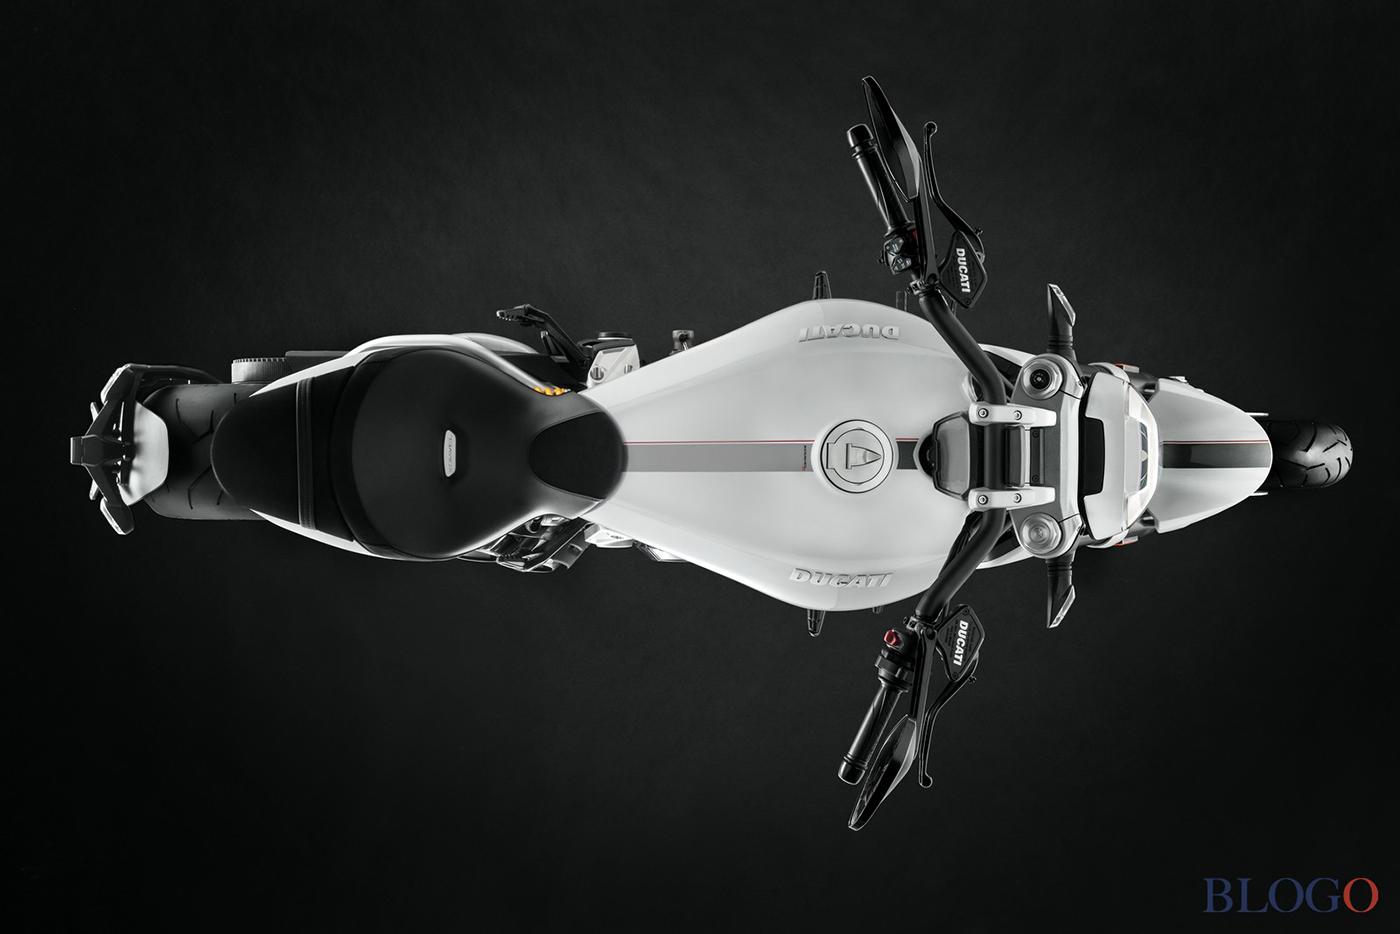 Ducati XDiavel S Iceberg White 2018 ra mắt đẹp ngất ngây